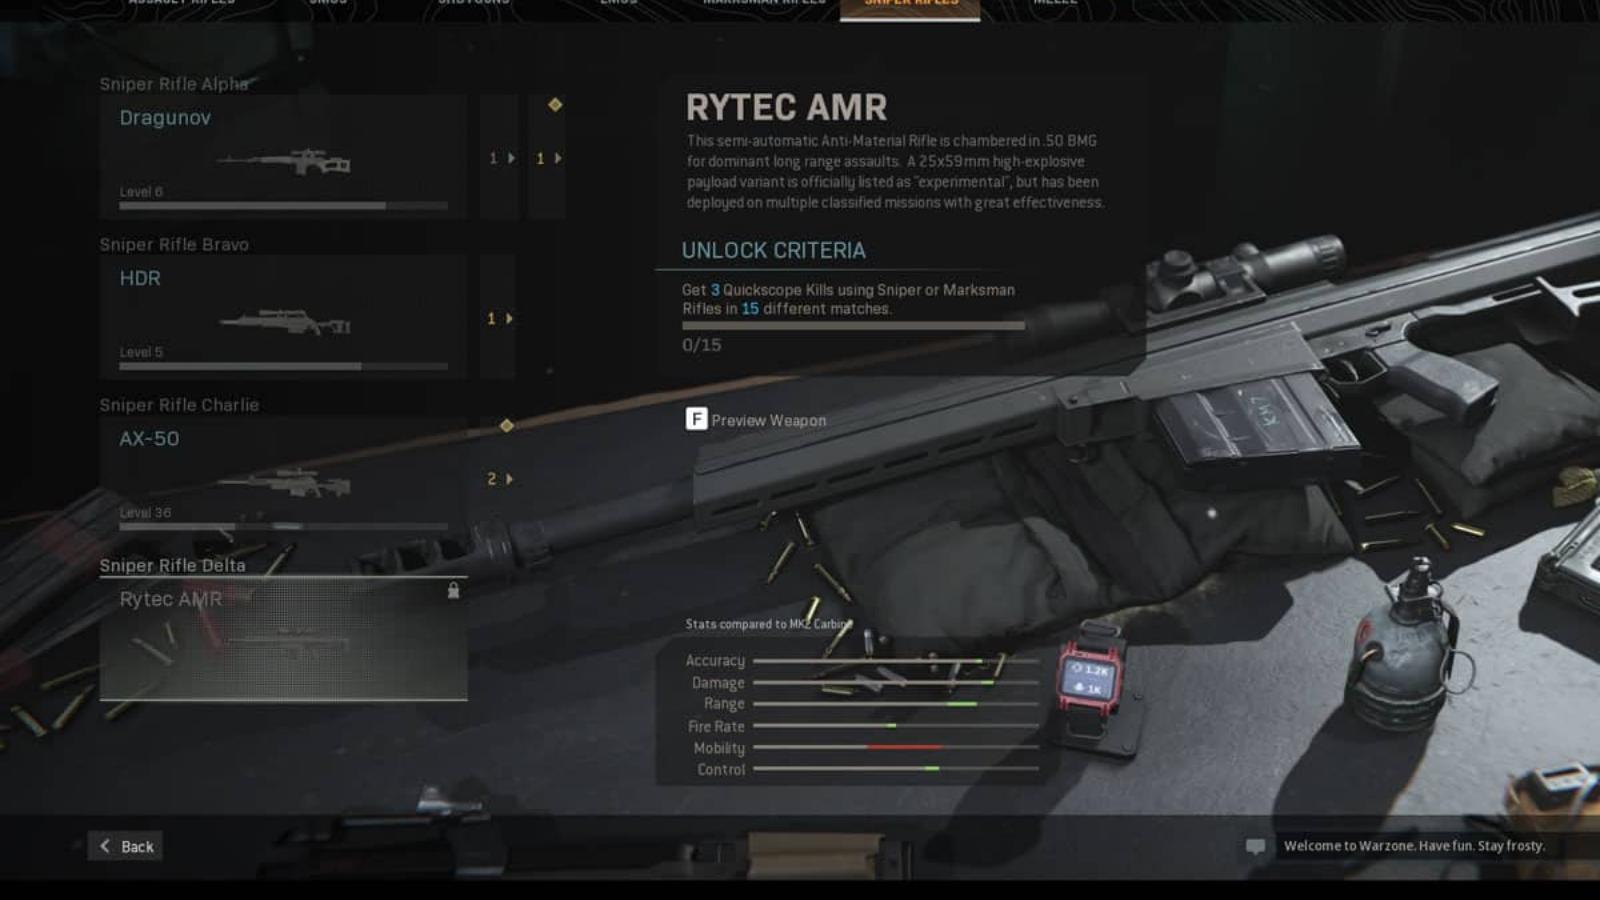 The Best Rytec AMR Warzone Loadout in Season 4